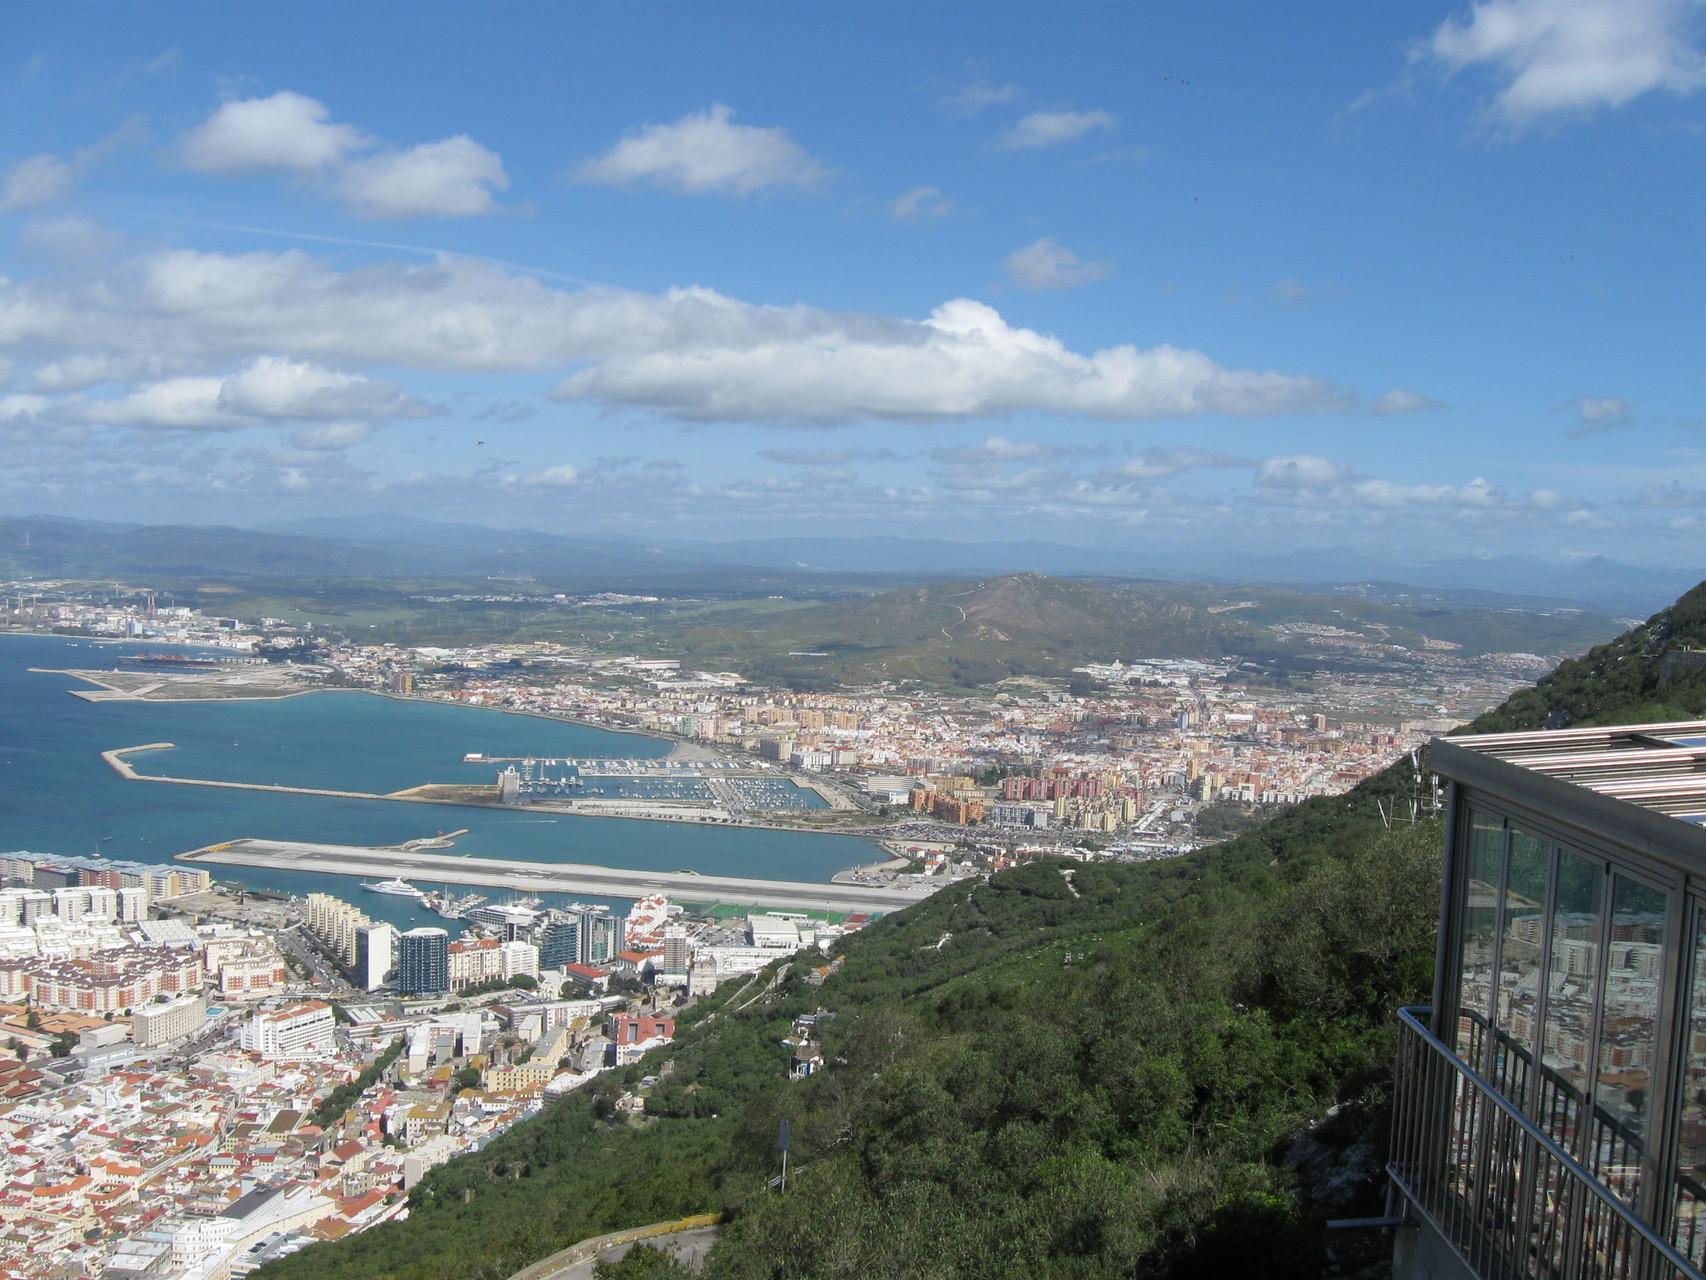 Blickrichtung La Línea Sporthafen